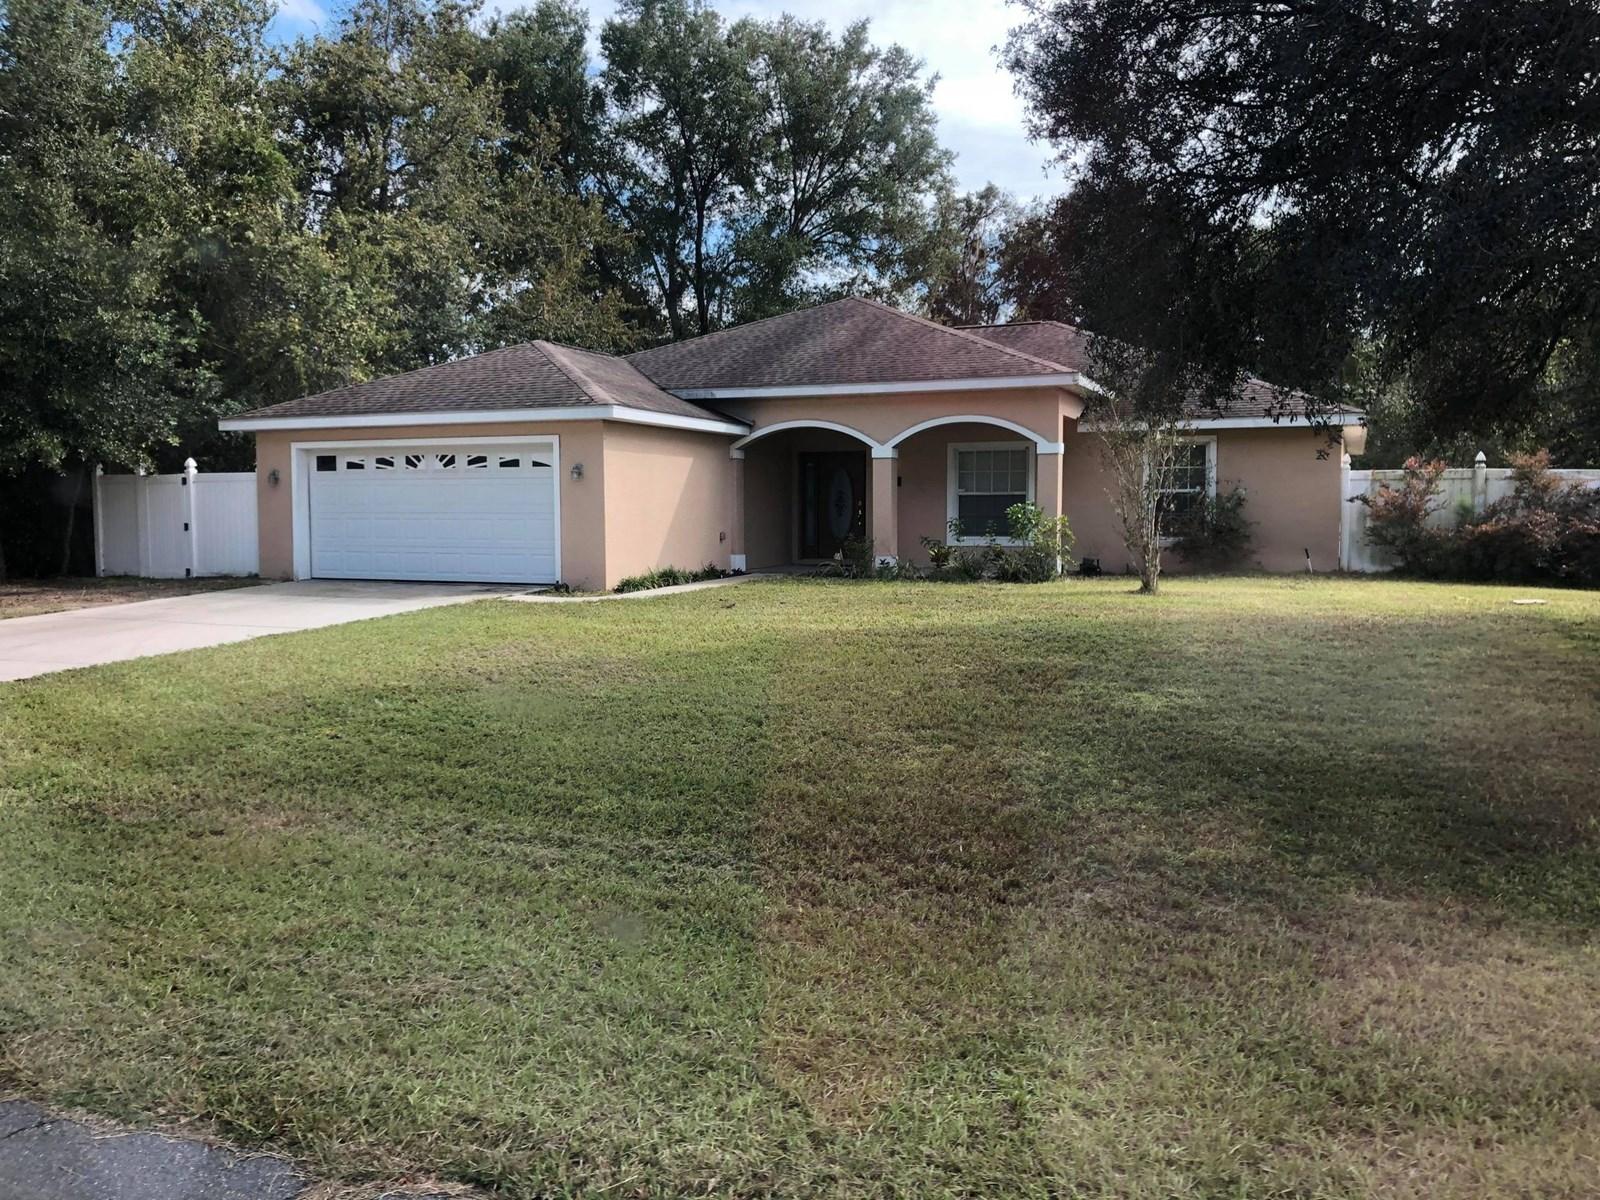 Homes Only! 4 BR/2BA Block home Marion Oaks, Ocala, FL